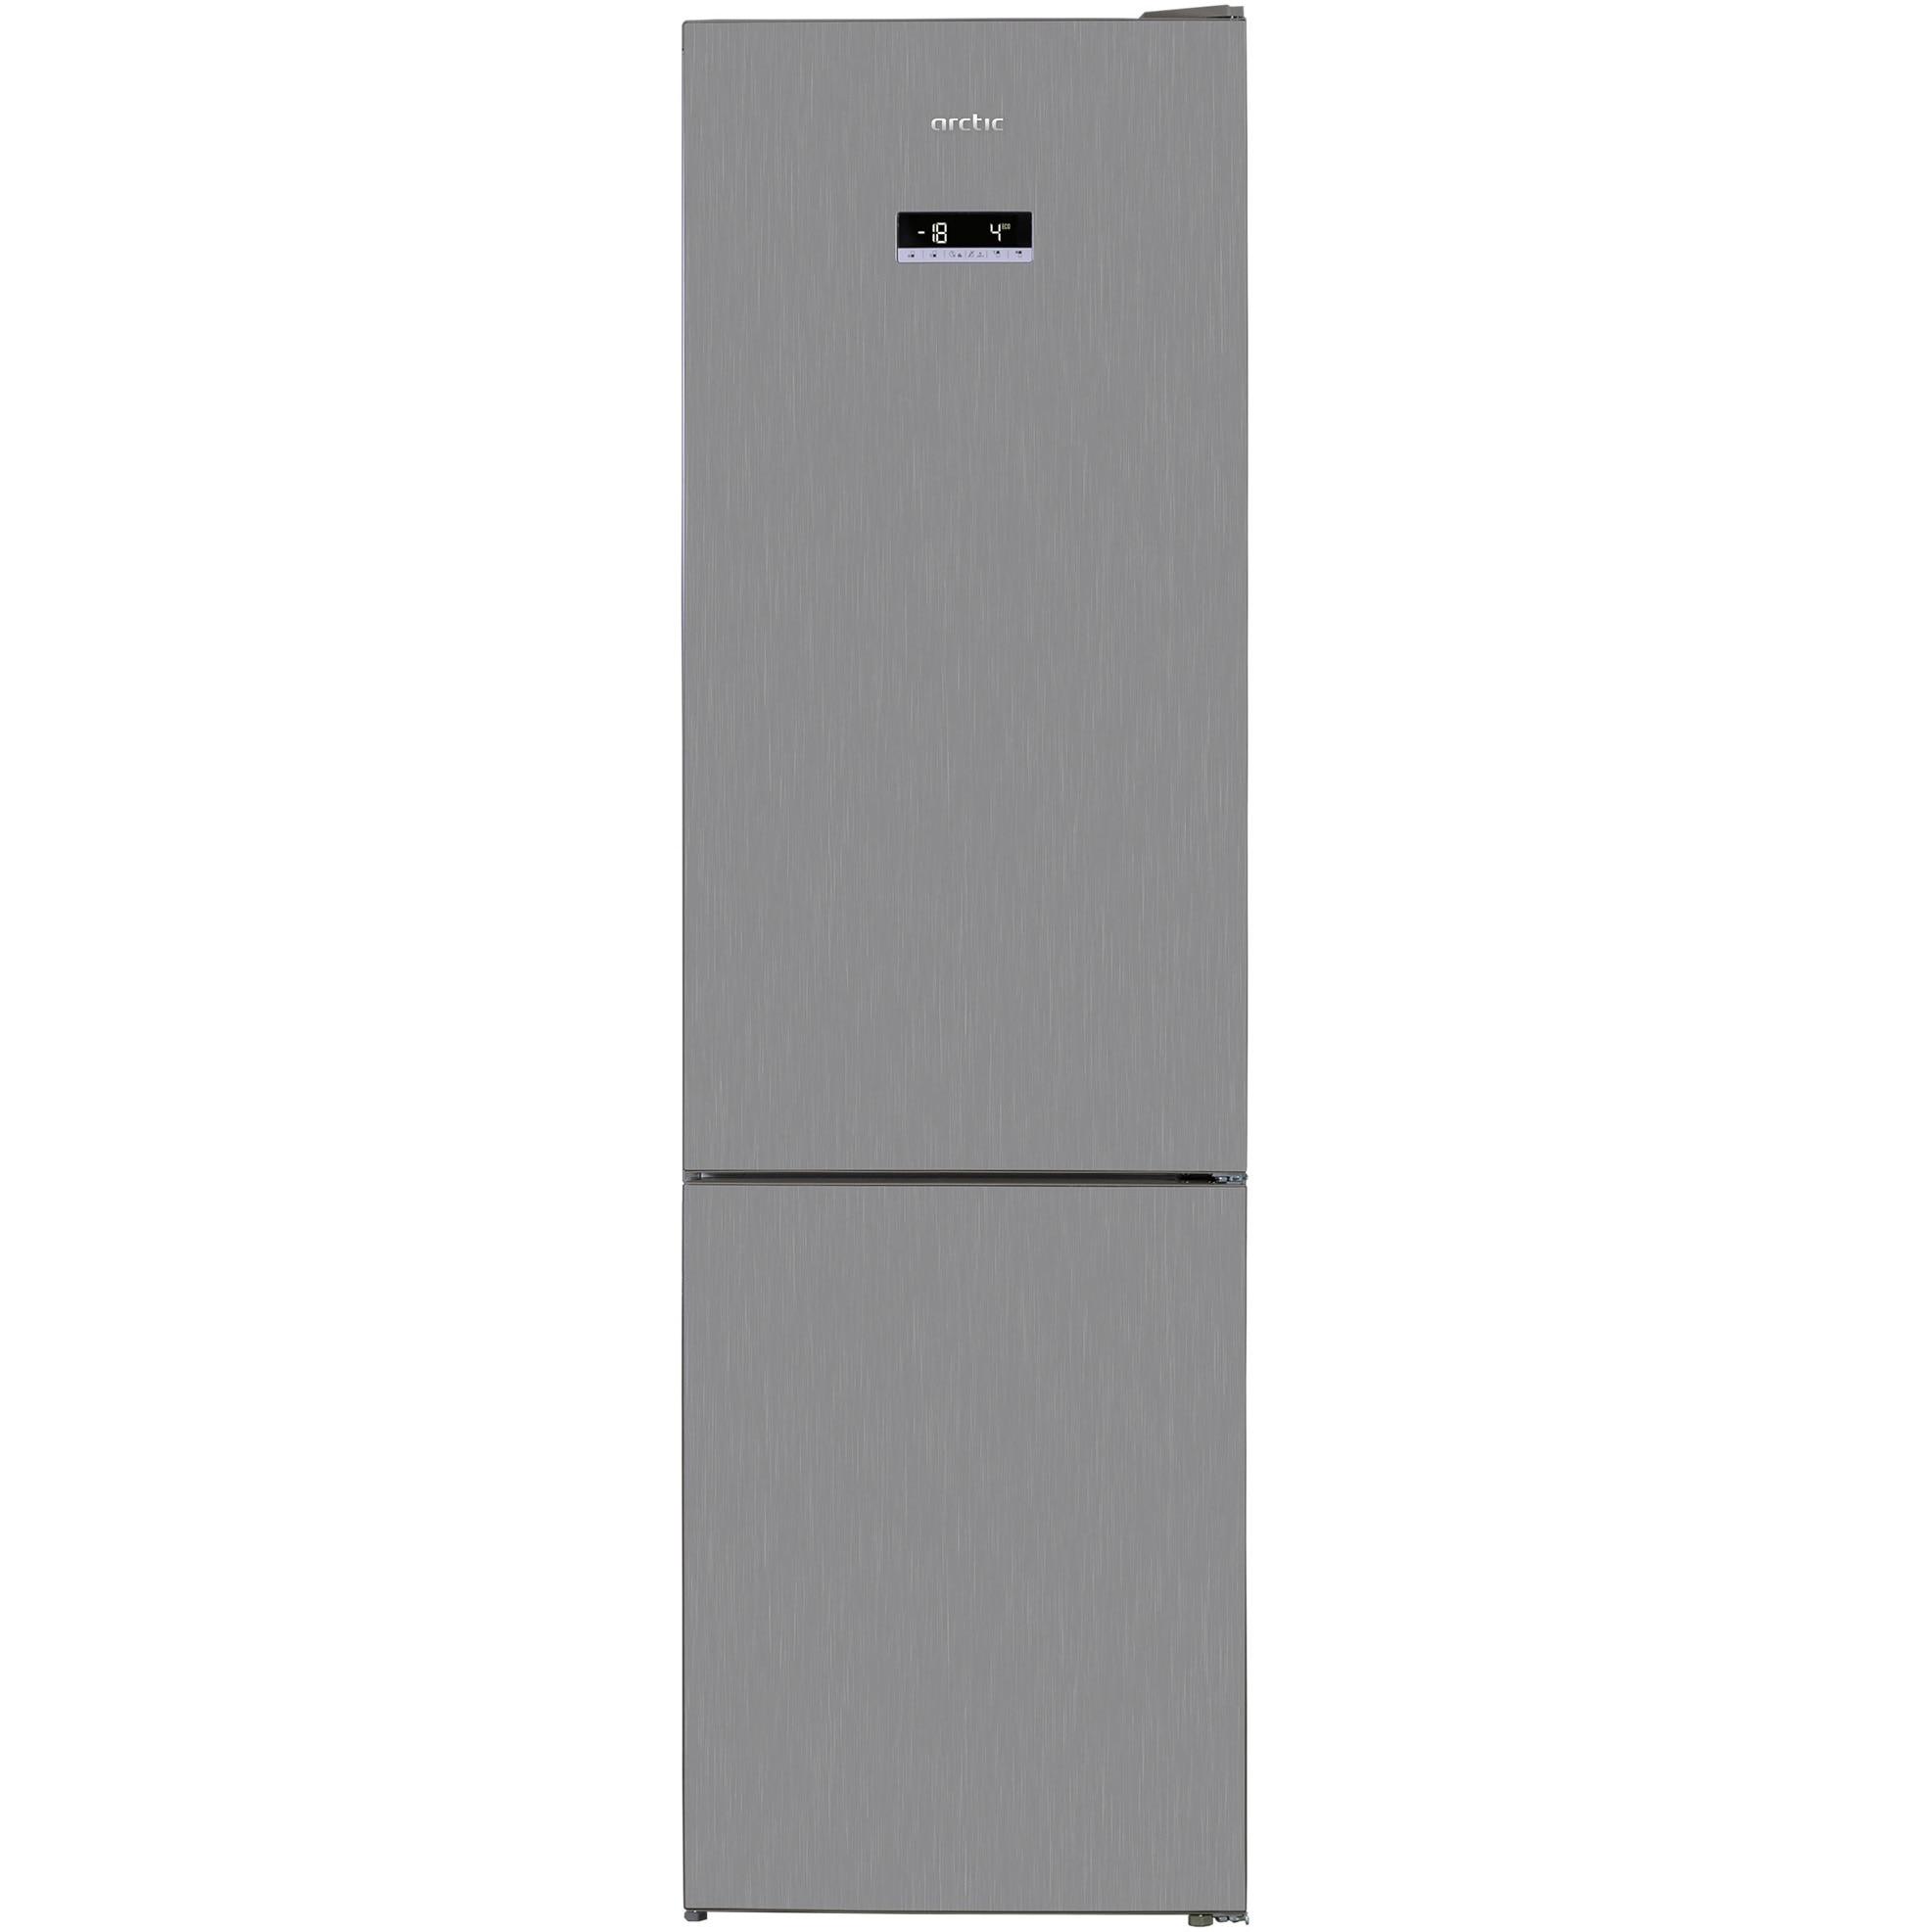 Fotografie Combina frigorifica semi-incorporabila Arctic AK60406E40NFMT, 362 l, NoFrost, Display, Air Flow, Clasa A++, H 202 cm, Argintiu